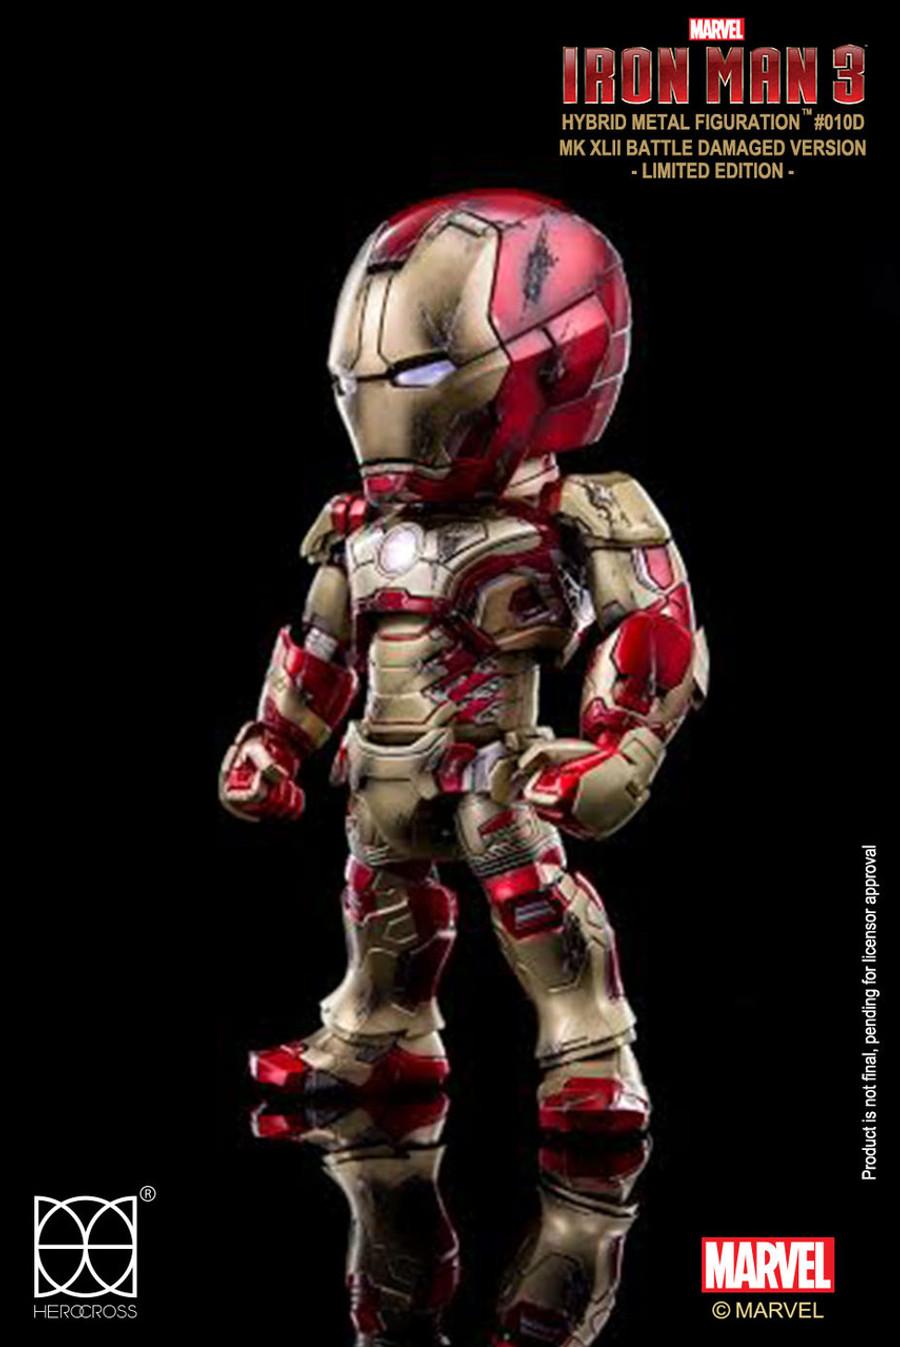 HEROCROSS - Iron Man Mark XLII Battle Damaged Limited Edition